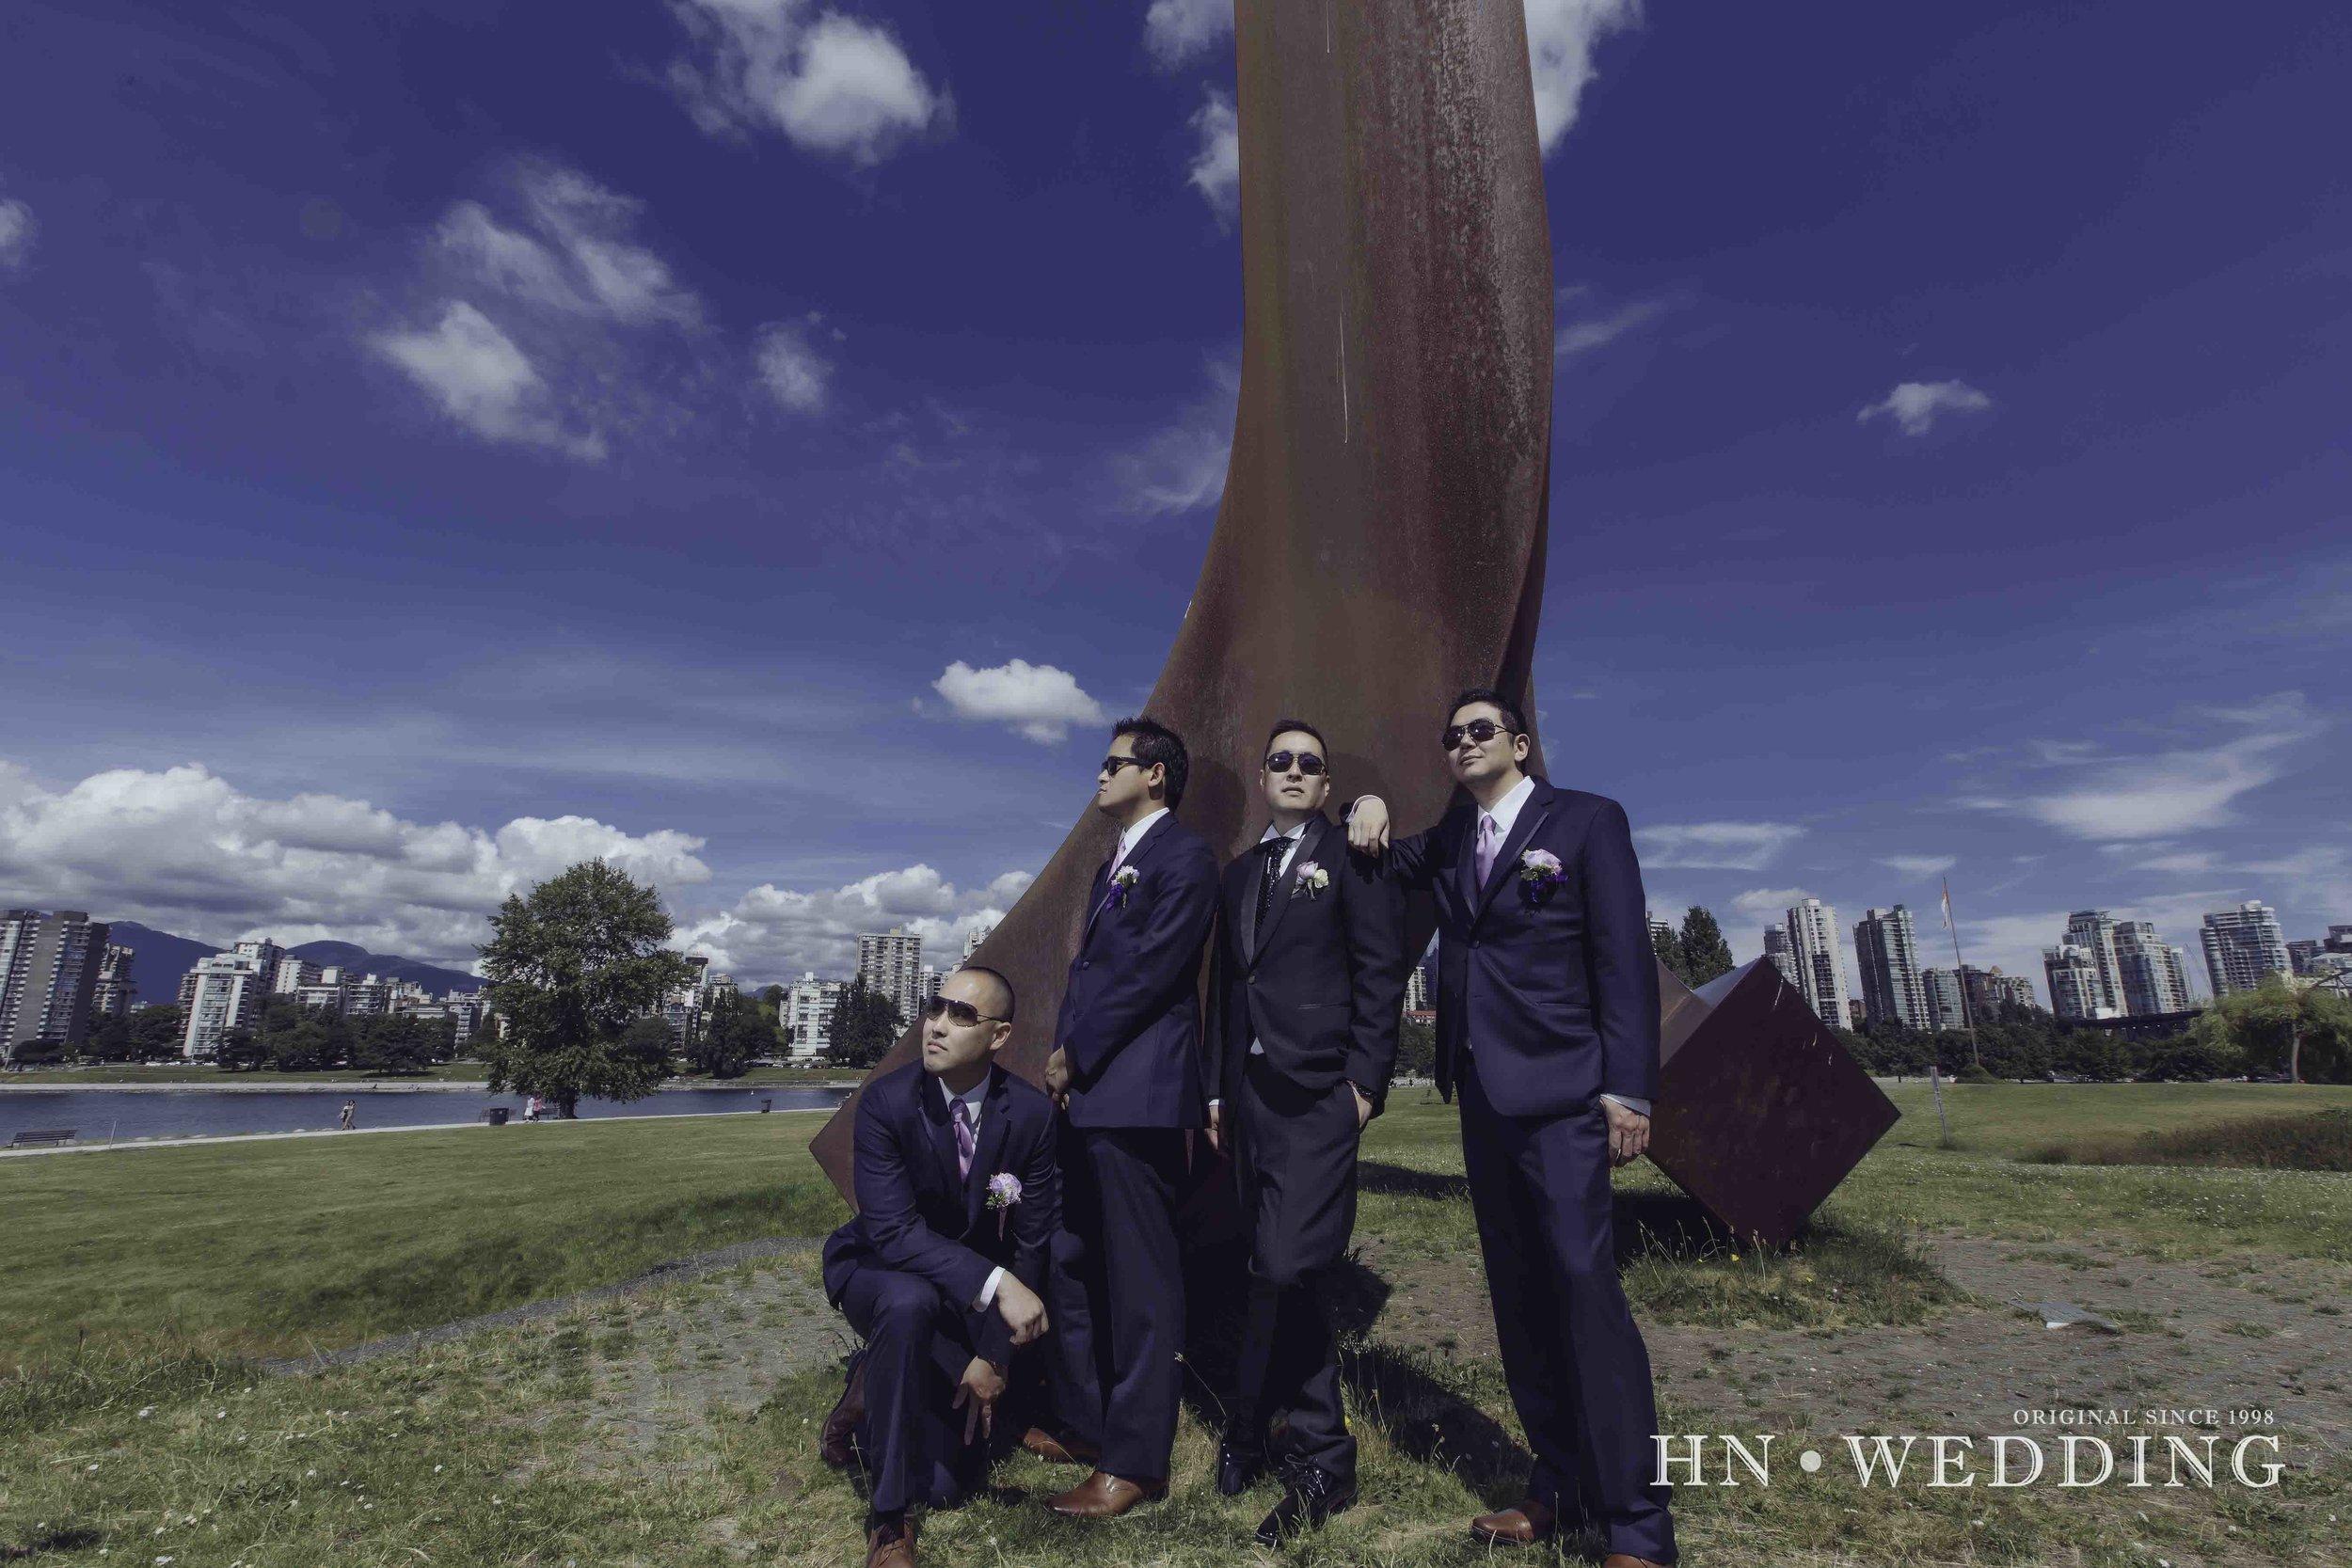 HNwedding-20160822-wedding-6541.jpg